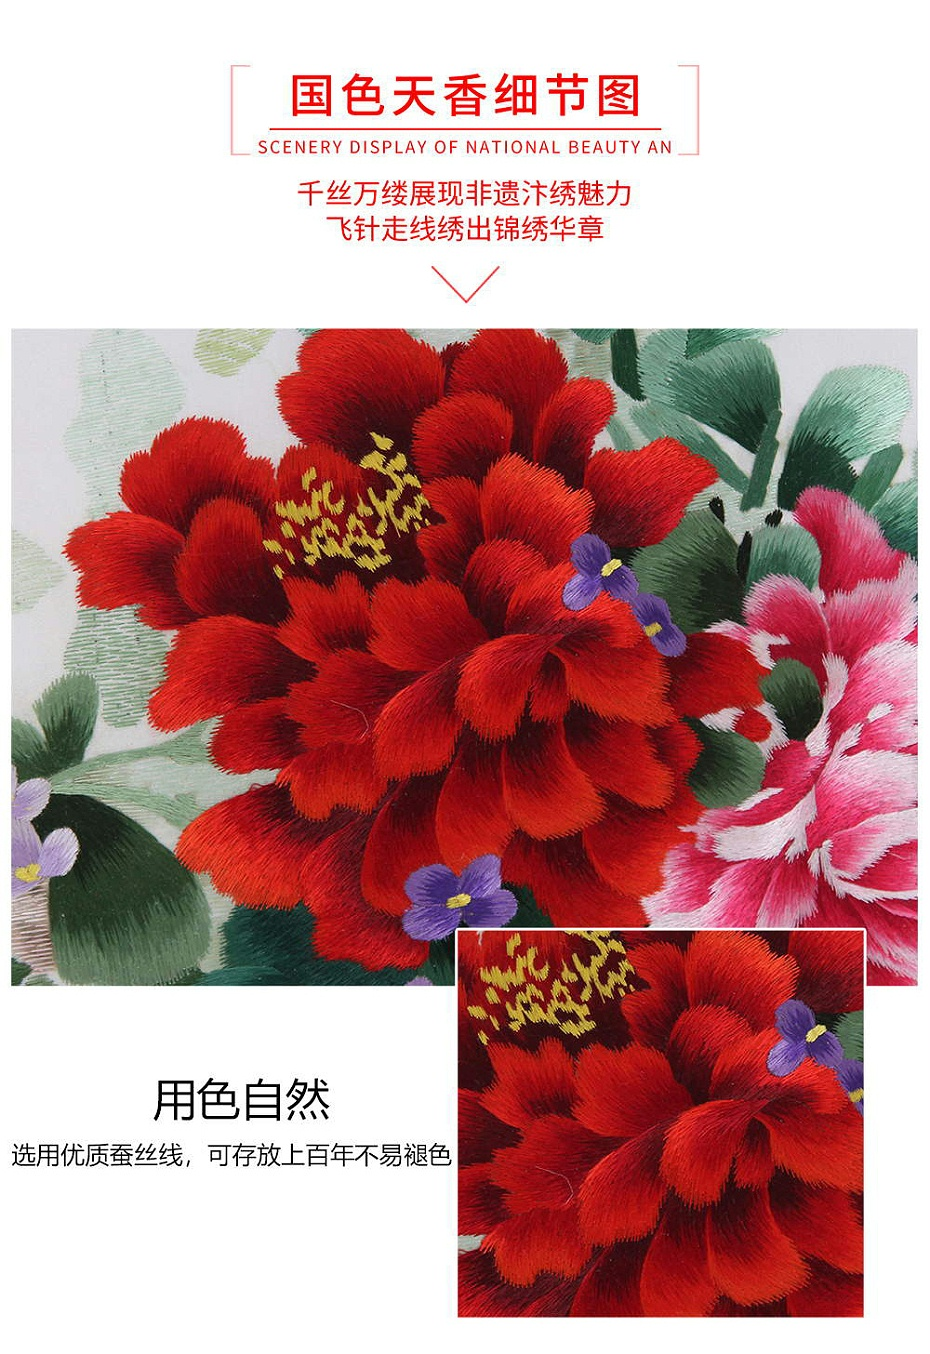 b9a3bfe7efc0b89282096df6feaa7d1_看图王_07